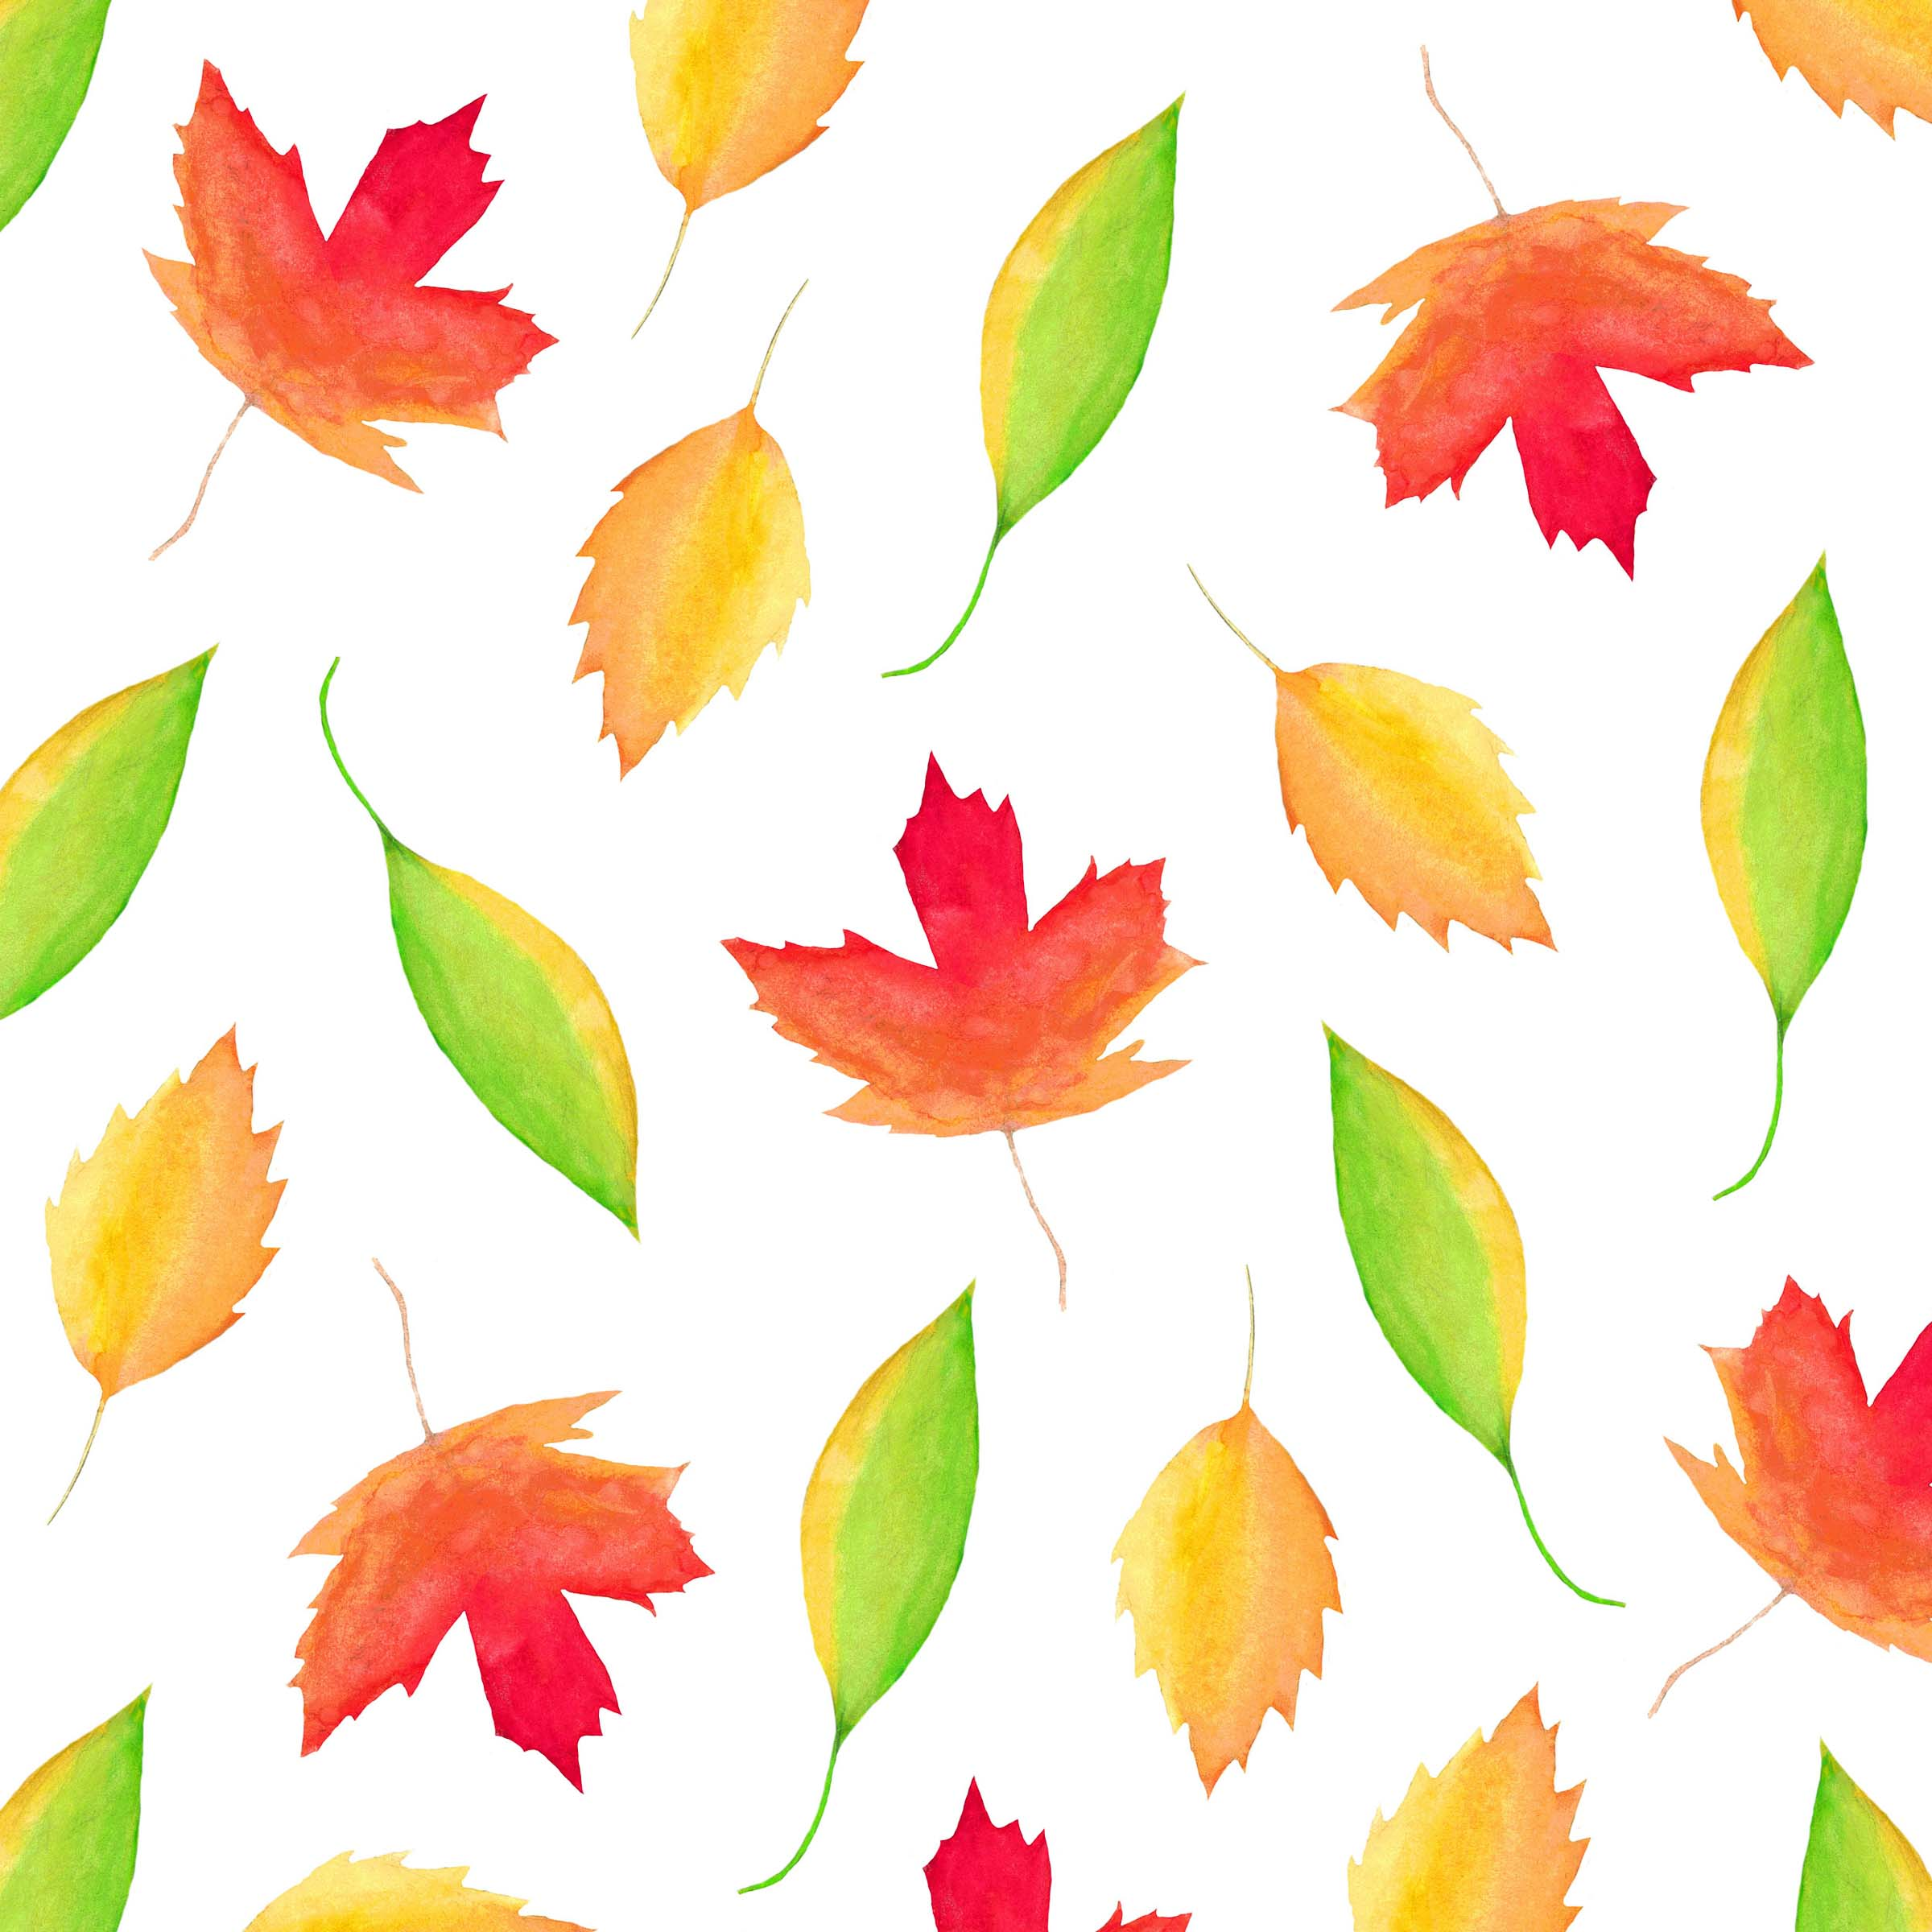 Fall Leaves Watercolor Print by Aliya Bora